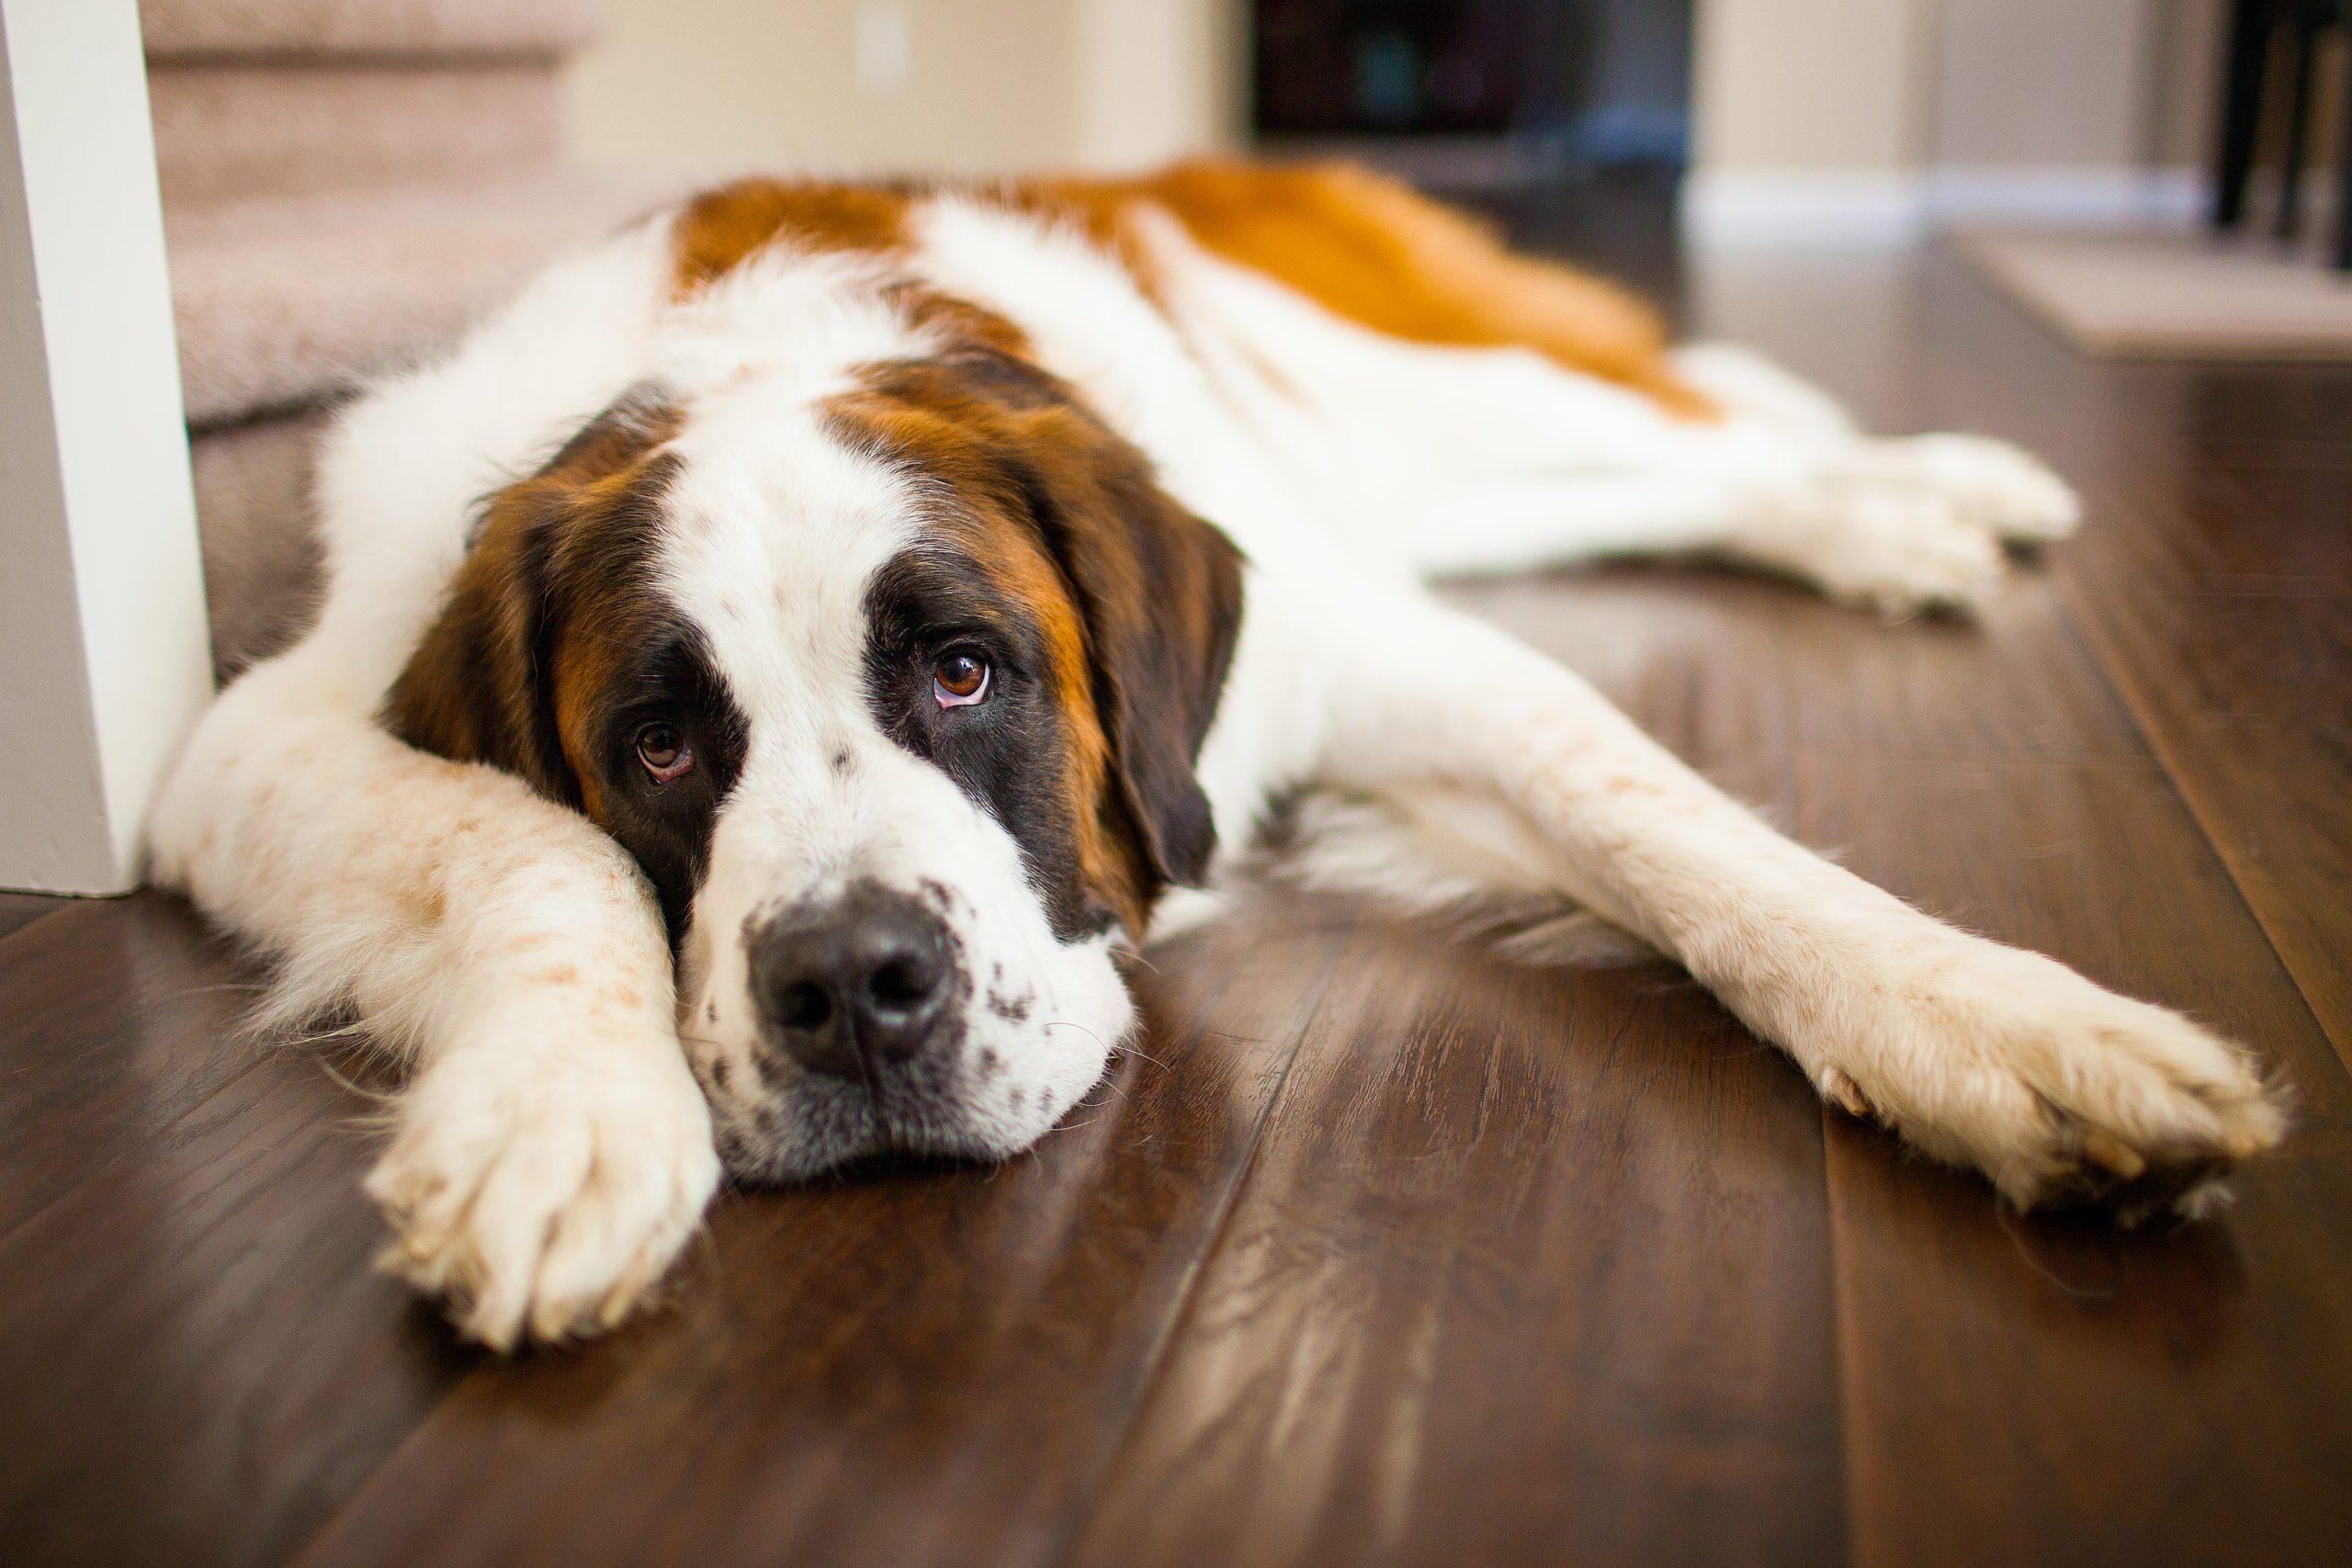 Lazy dog breeds - Saint bernard